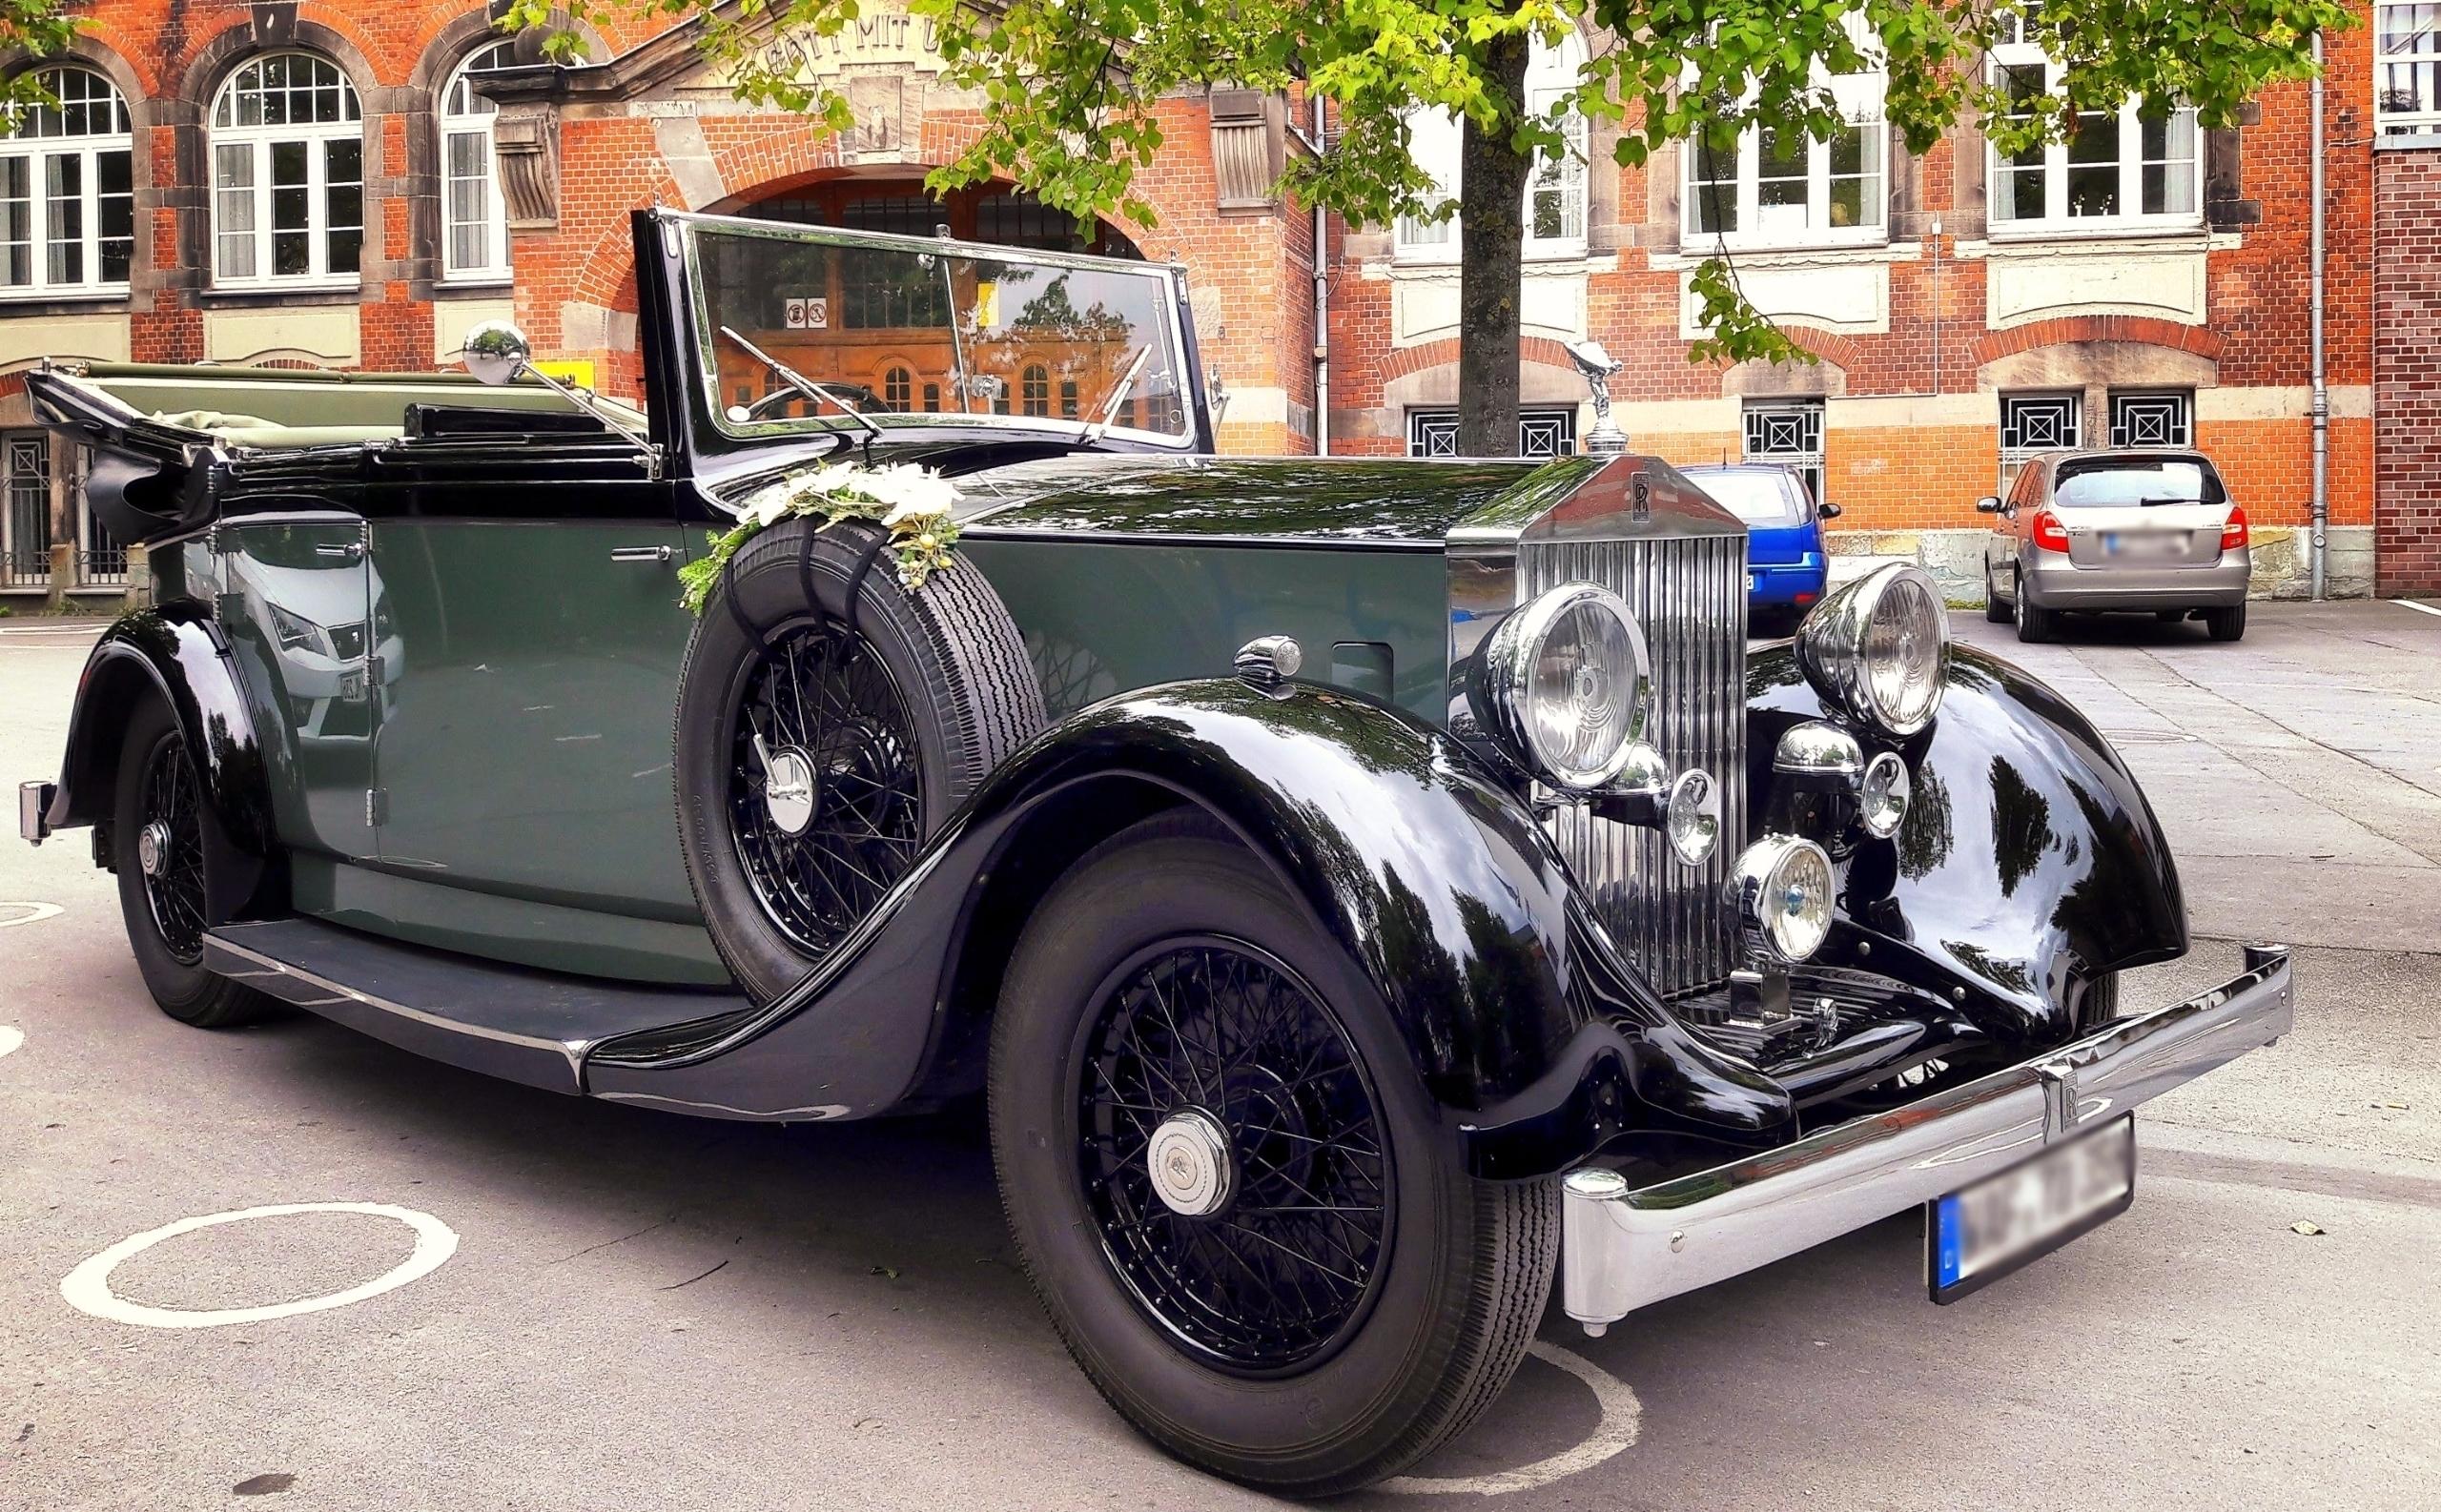 Oldtimer Rolls Royce 20/25 Bark - klausheeskens | ello